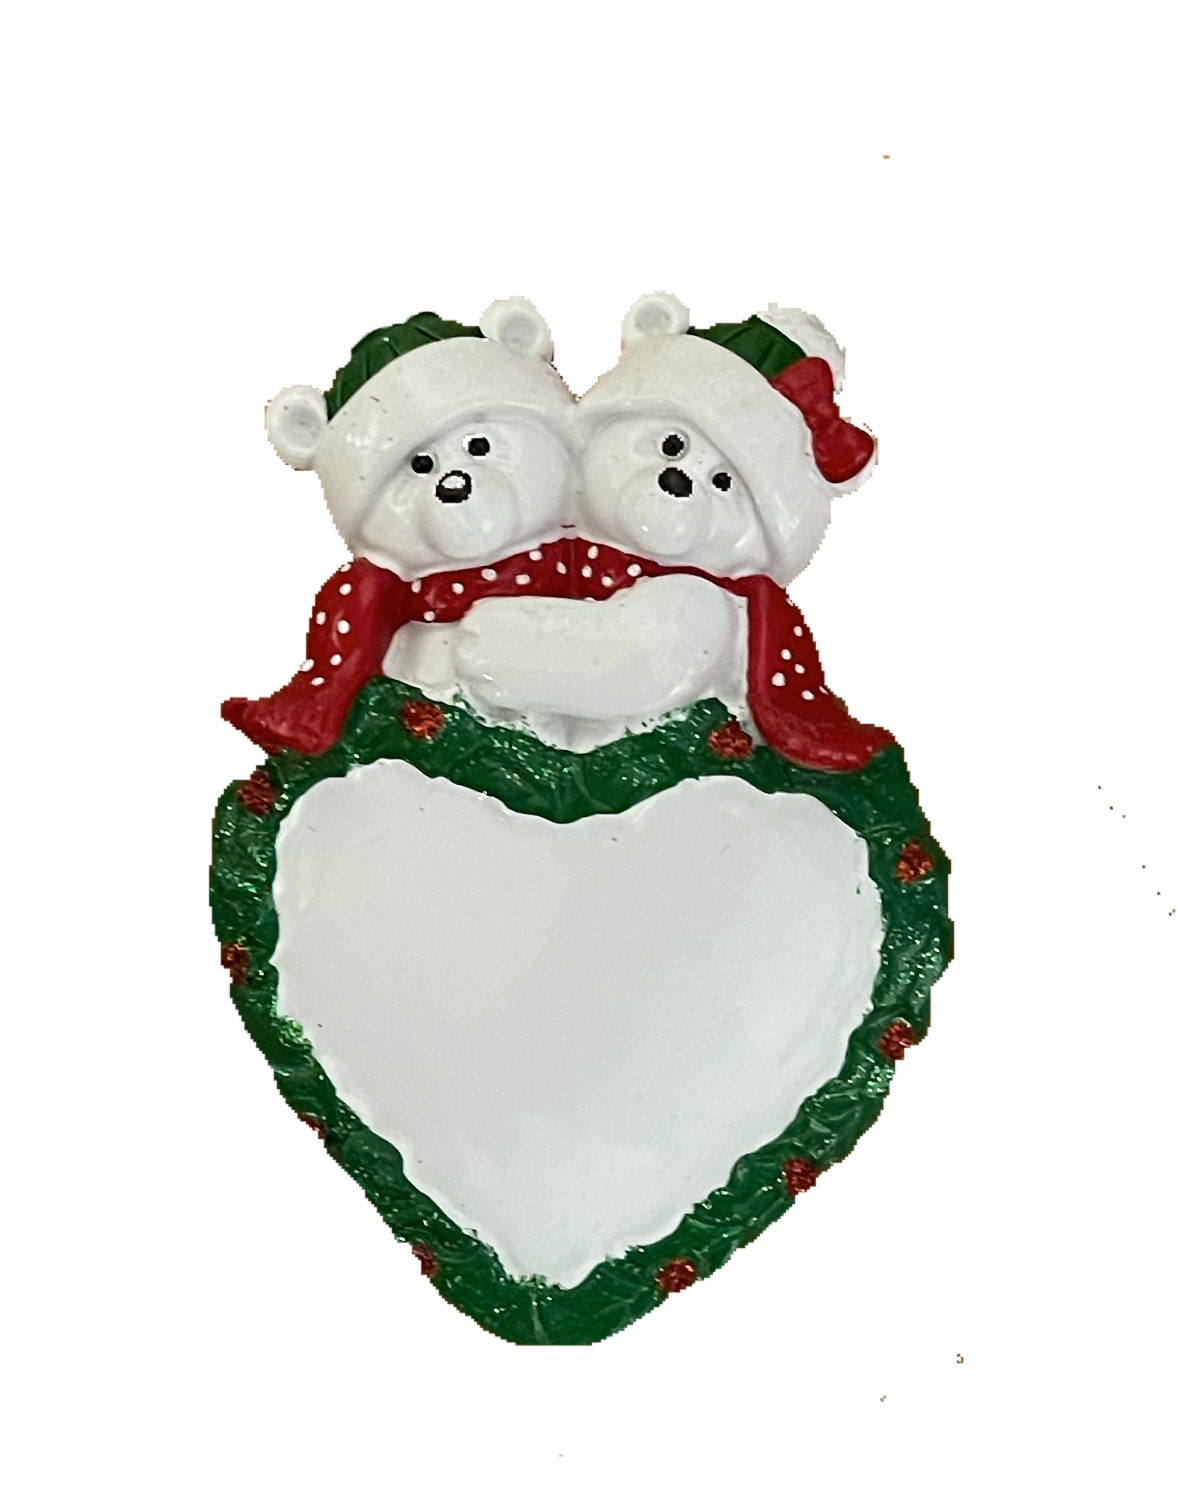 bear and heart couple  Ornament